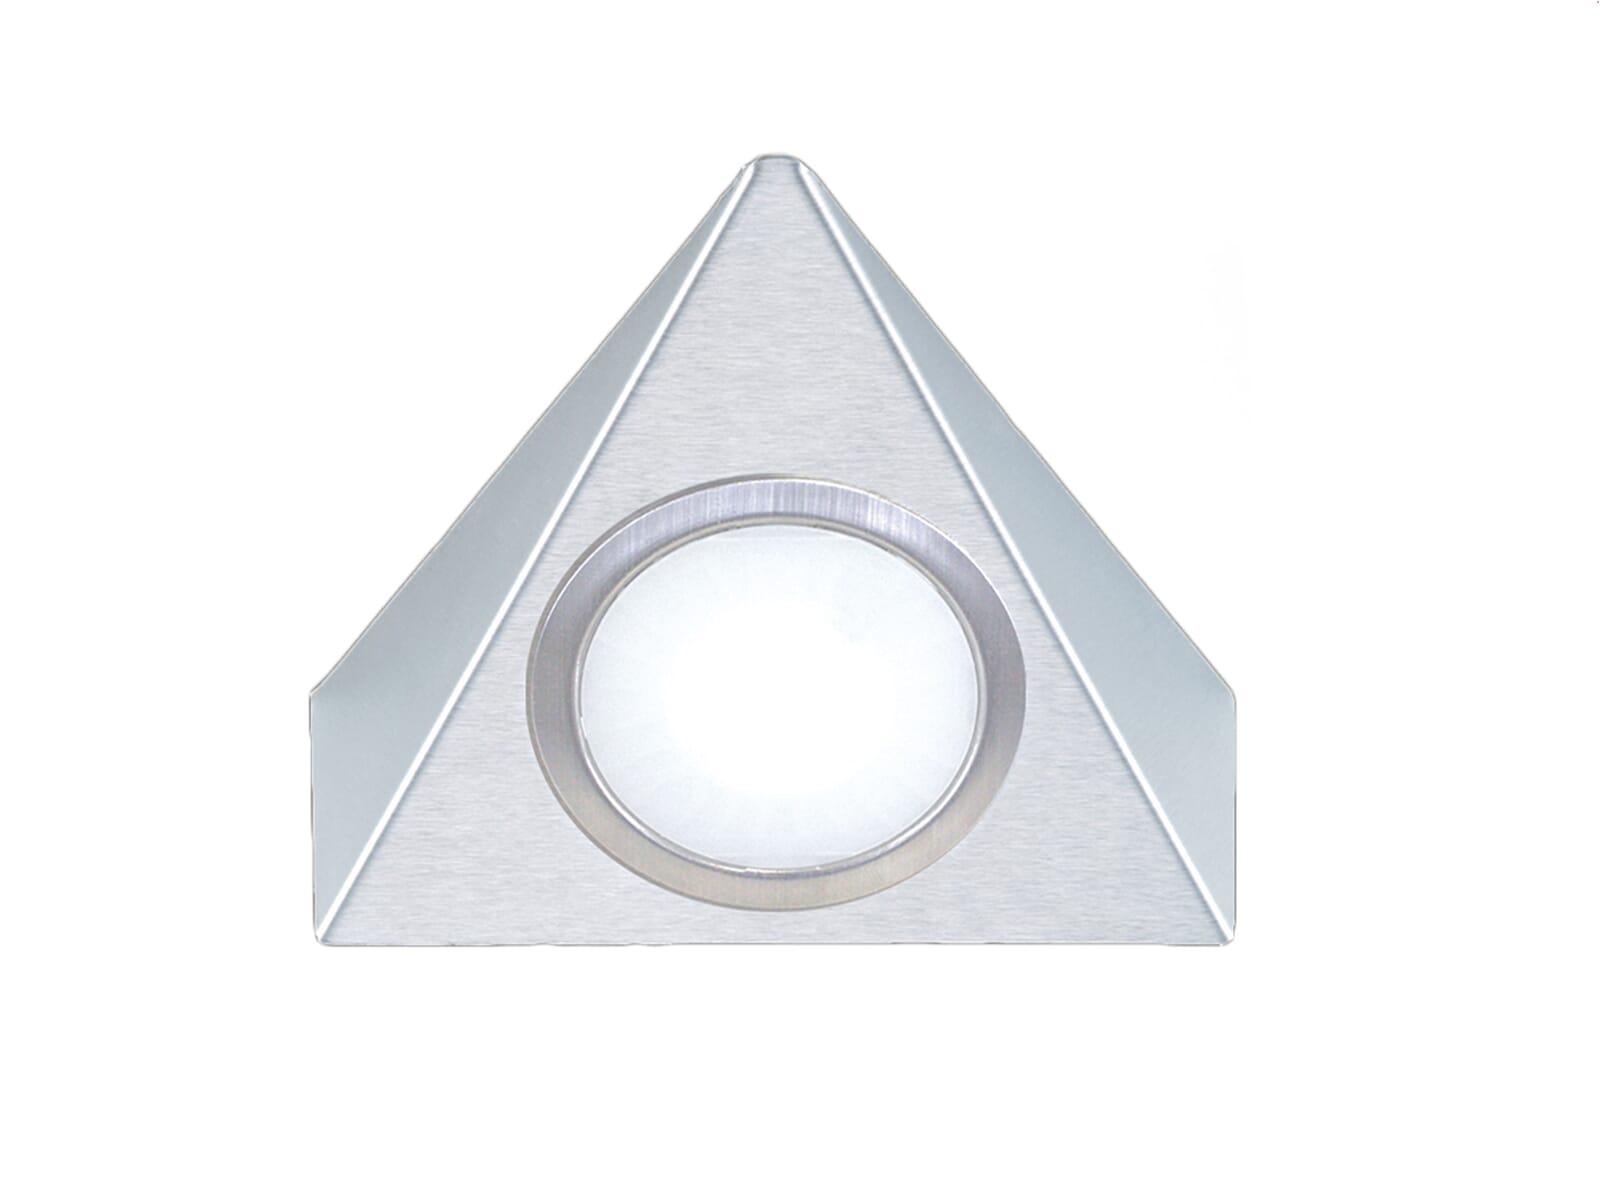 Sagemüller & Rohrer TriaLED 30702 Leuchten